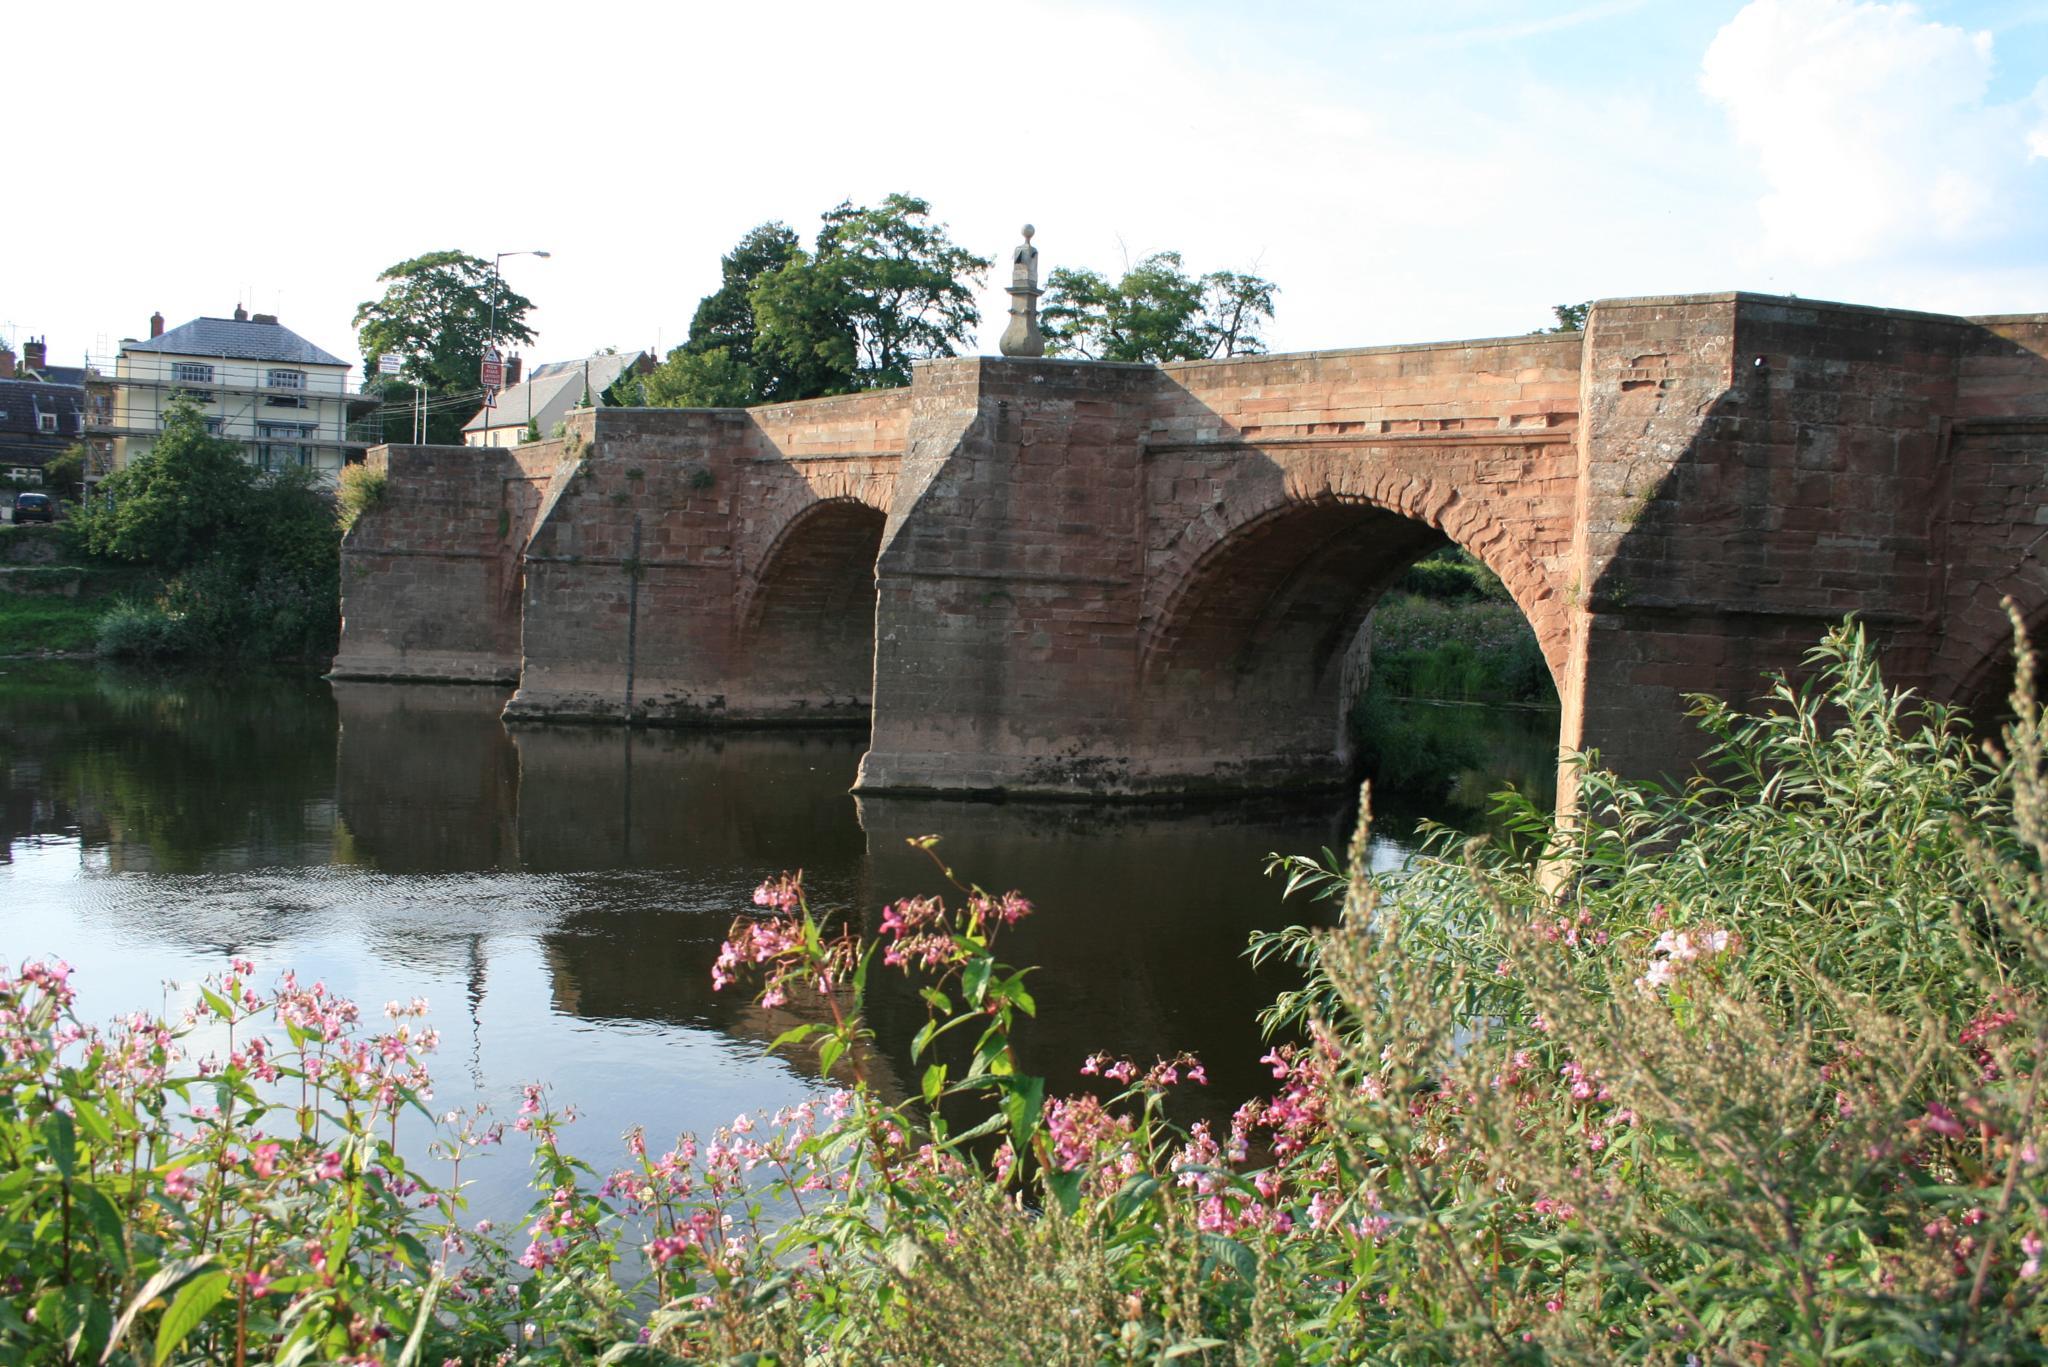 Wilton Bridge Ross-On-Wye by gardenman1967